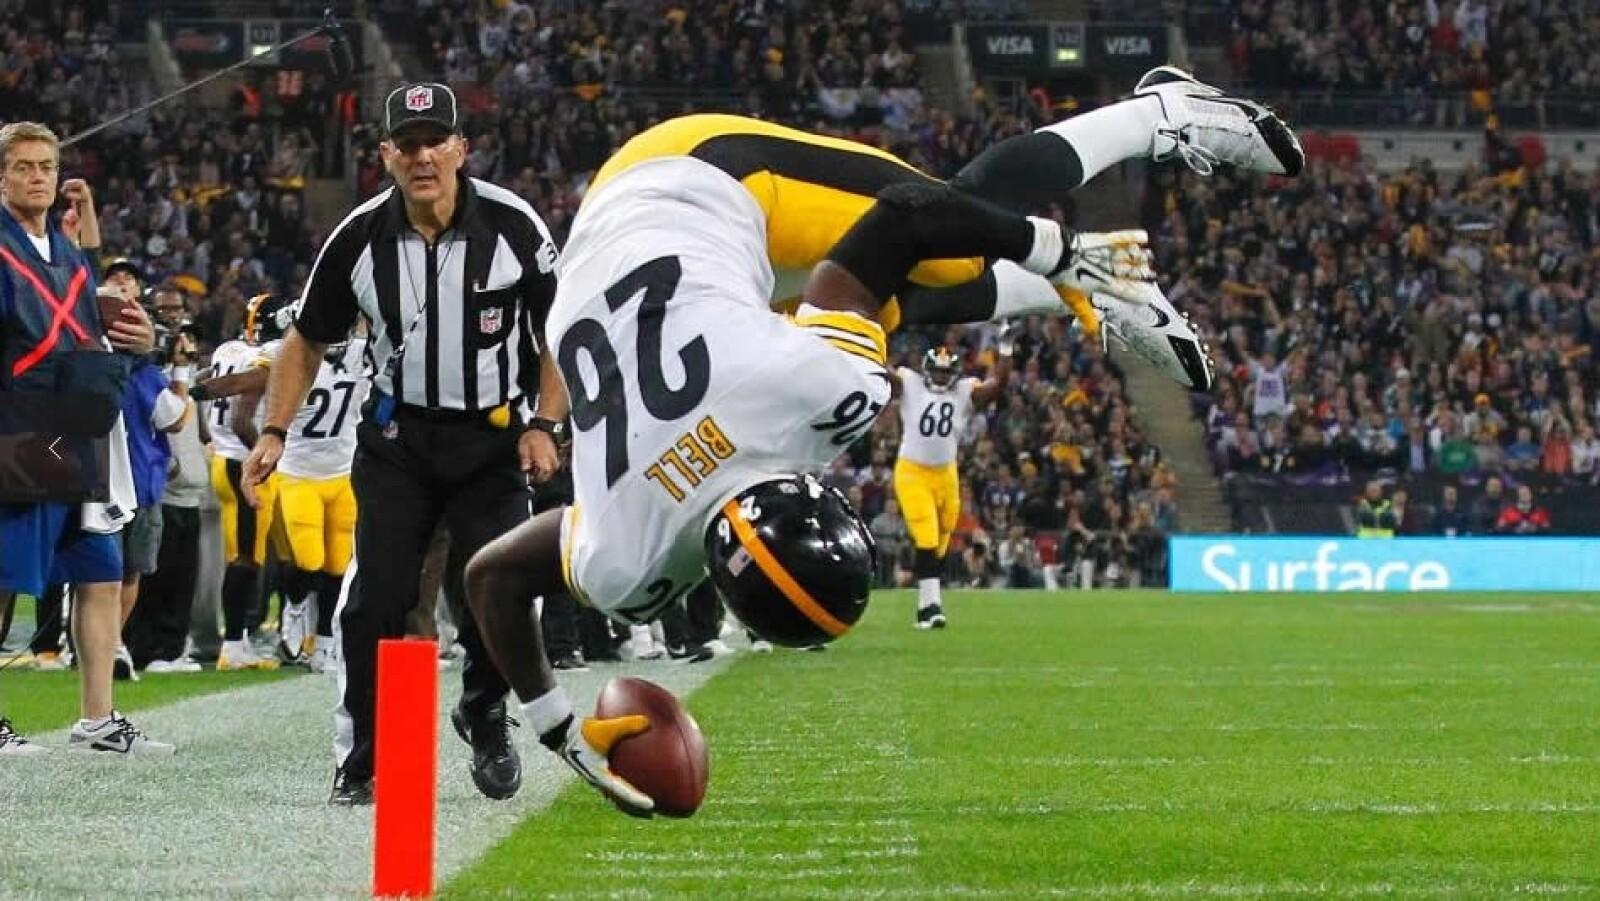 Acereros de Pittsburgh corredor touchdown